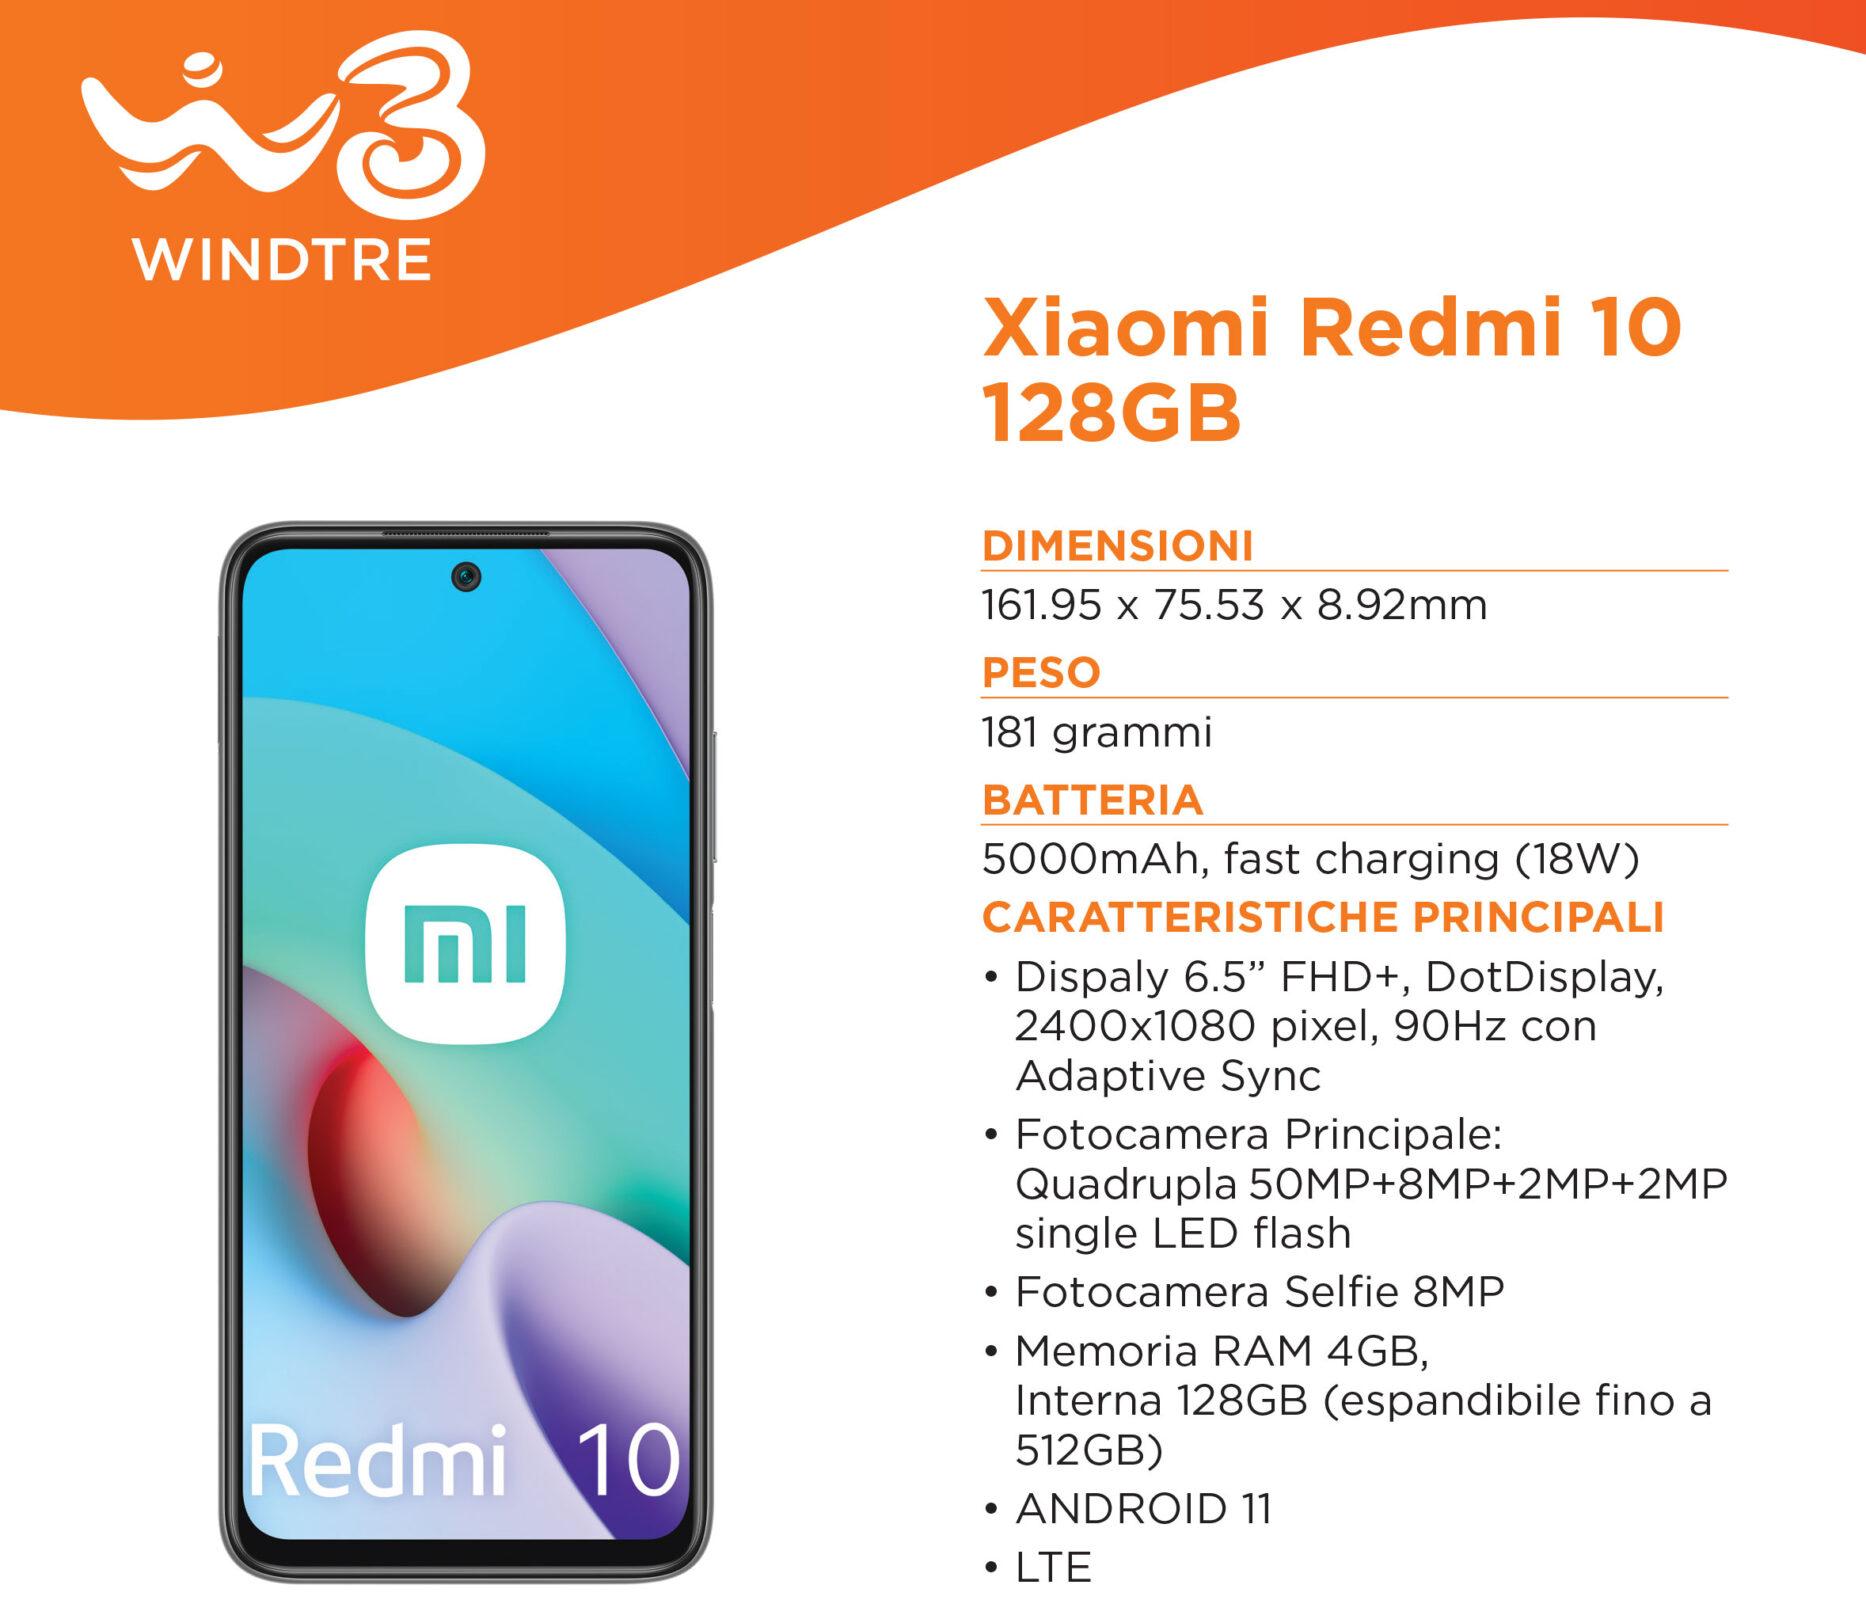 Xiaomi Redmi 10 128 GB WINDTRE